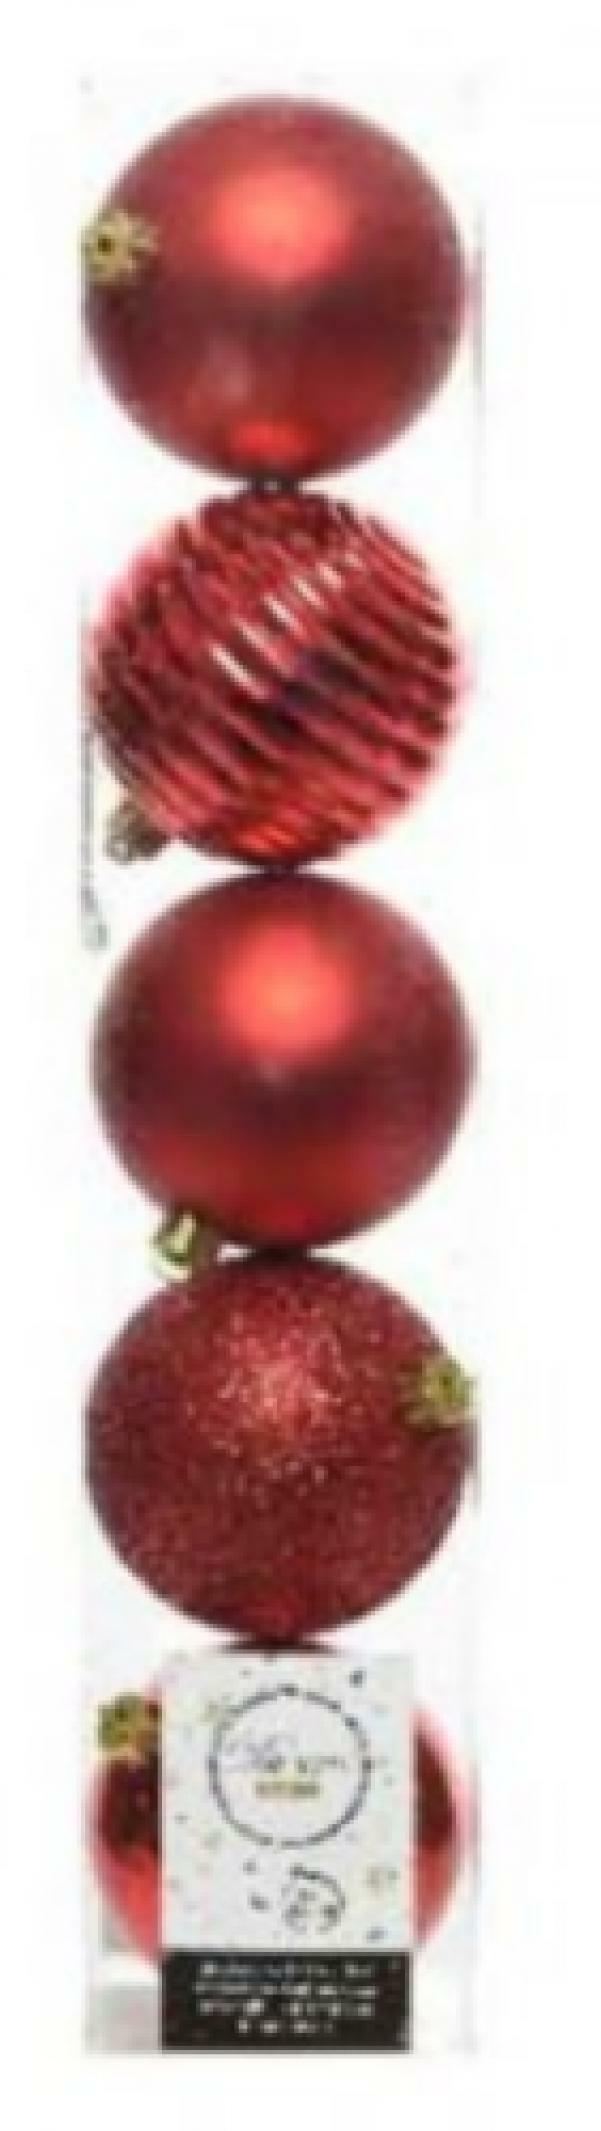 kaemingk kaemingk 5 palle r 8 cm - colore rosso